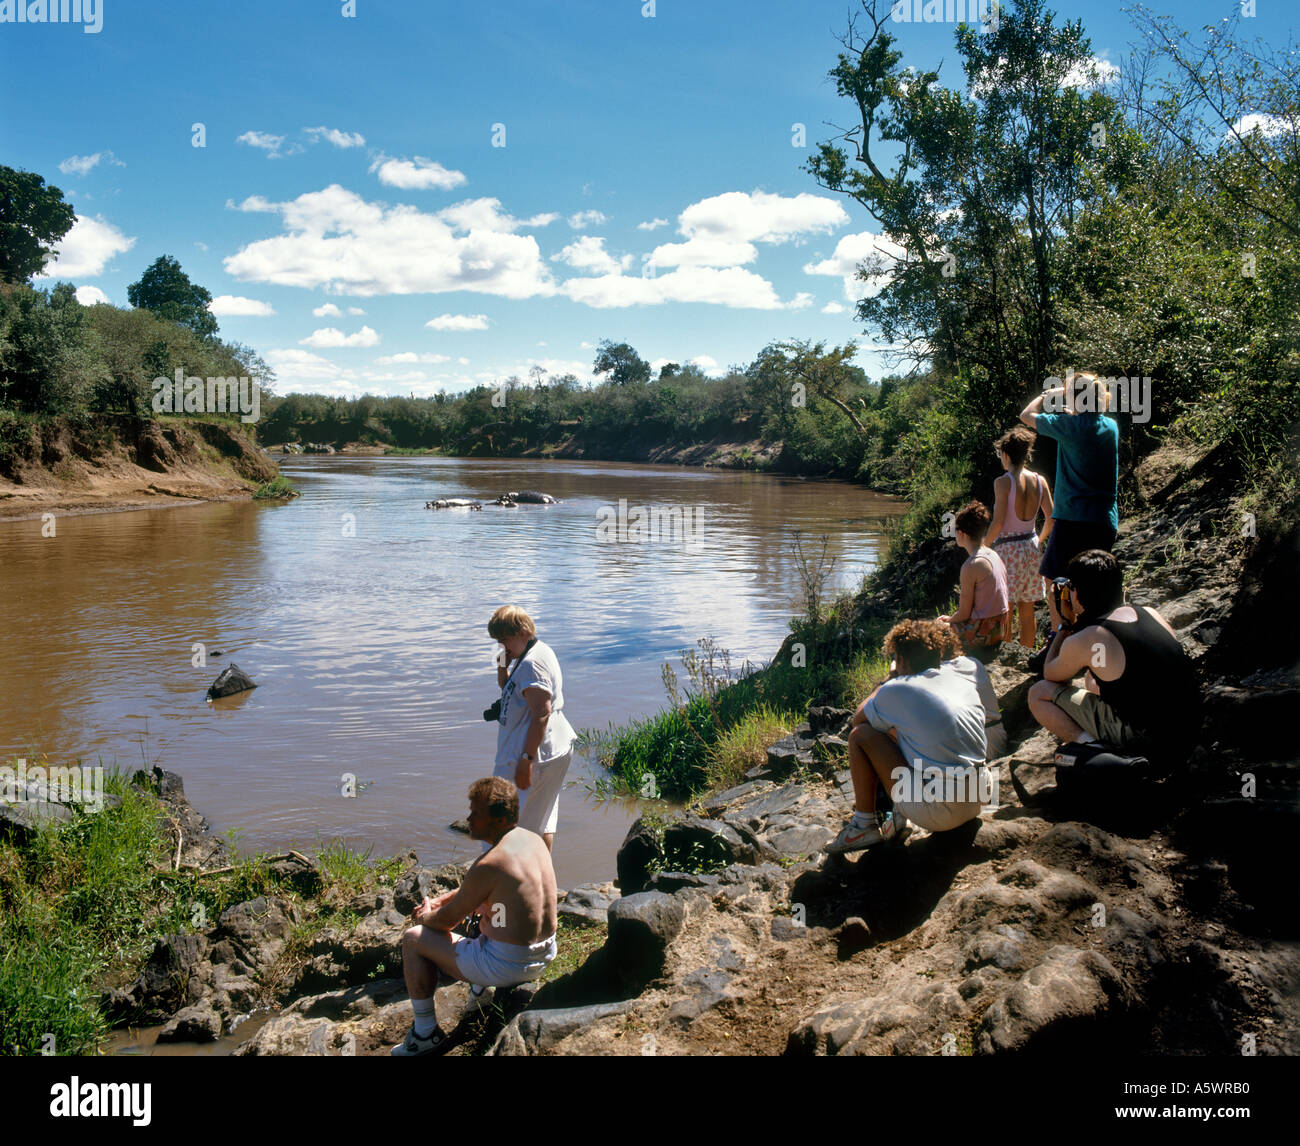 Les touristes à regarder les hippopotames dans la rivière Mara, la Réserve Naturelle de Masai Mara, Narok, Kenya, Banque D'Images